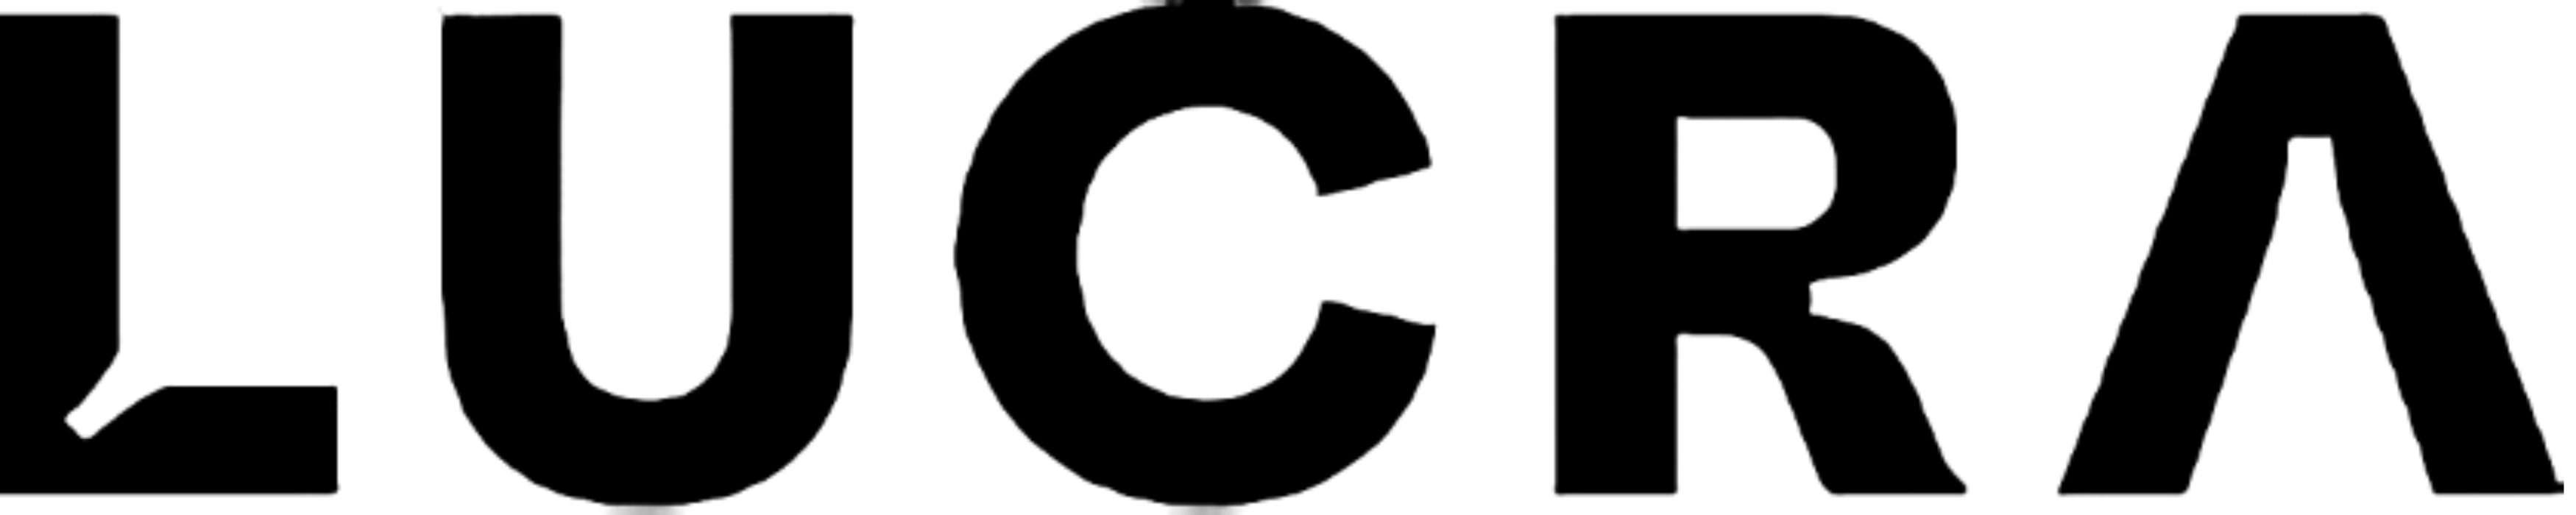 Lucra logo black